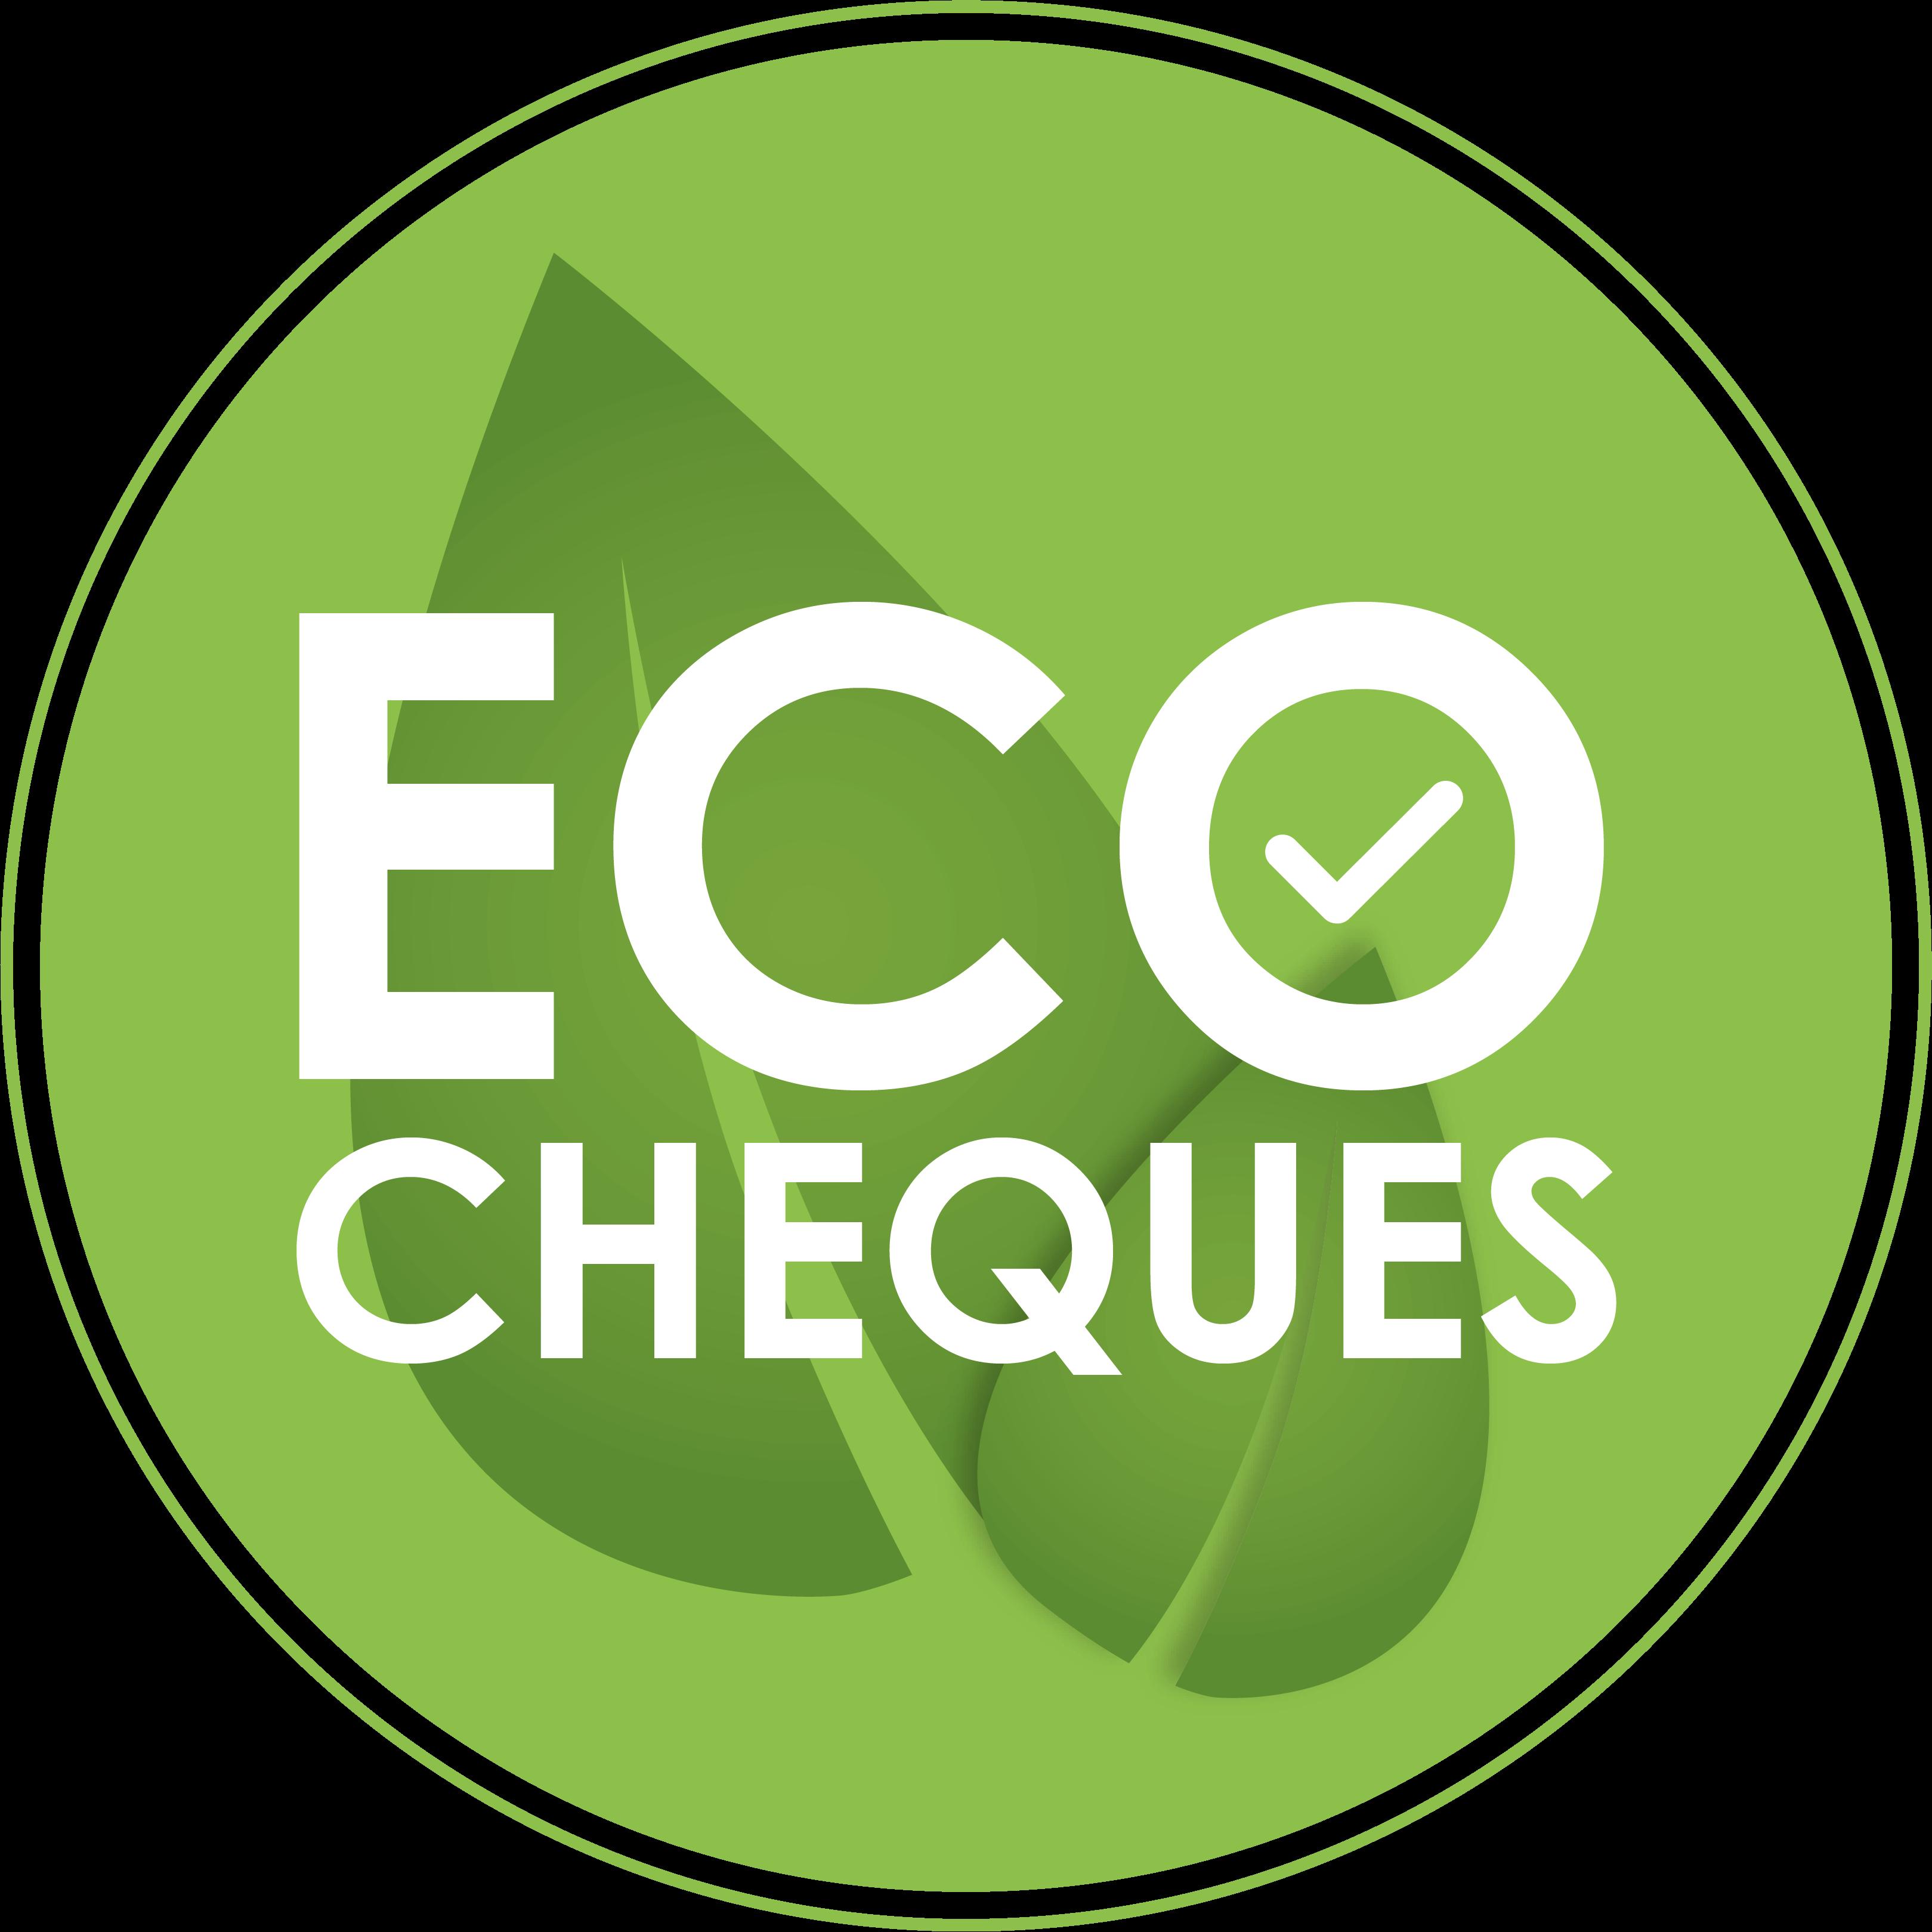 Eco cheque logo